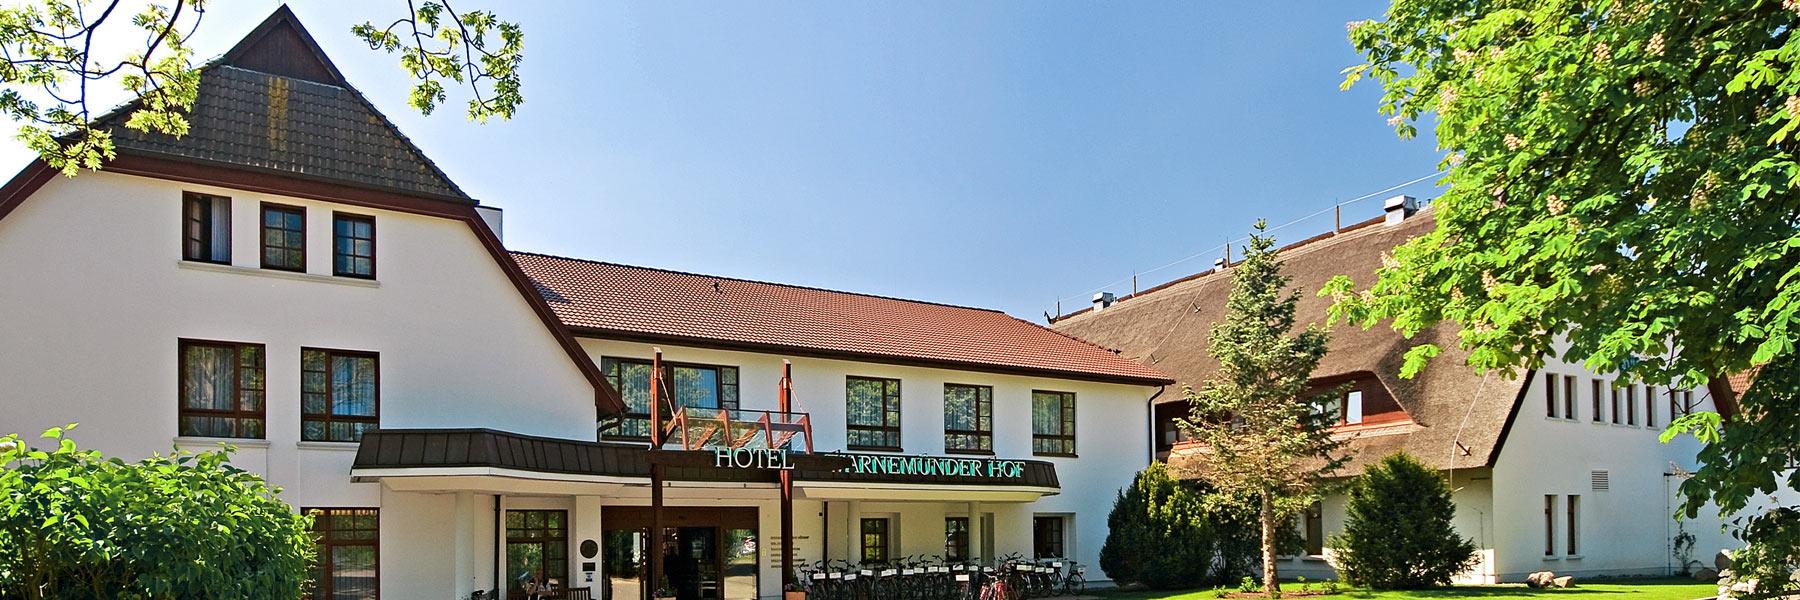 Aussenaufnahme - Hotel Warnemünder Hof